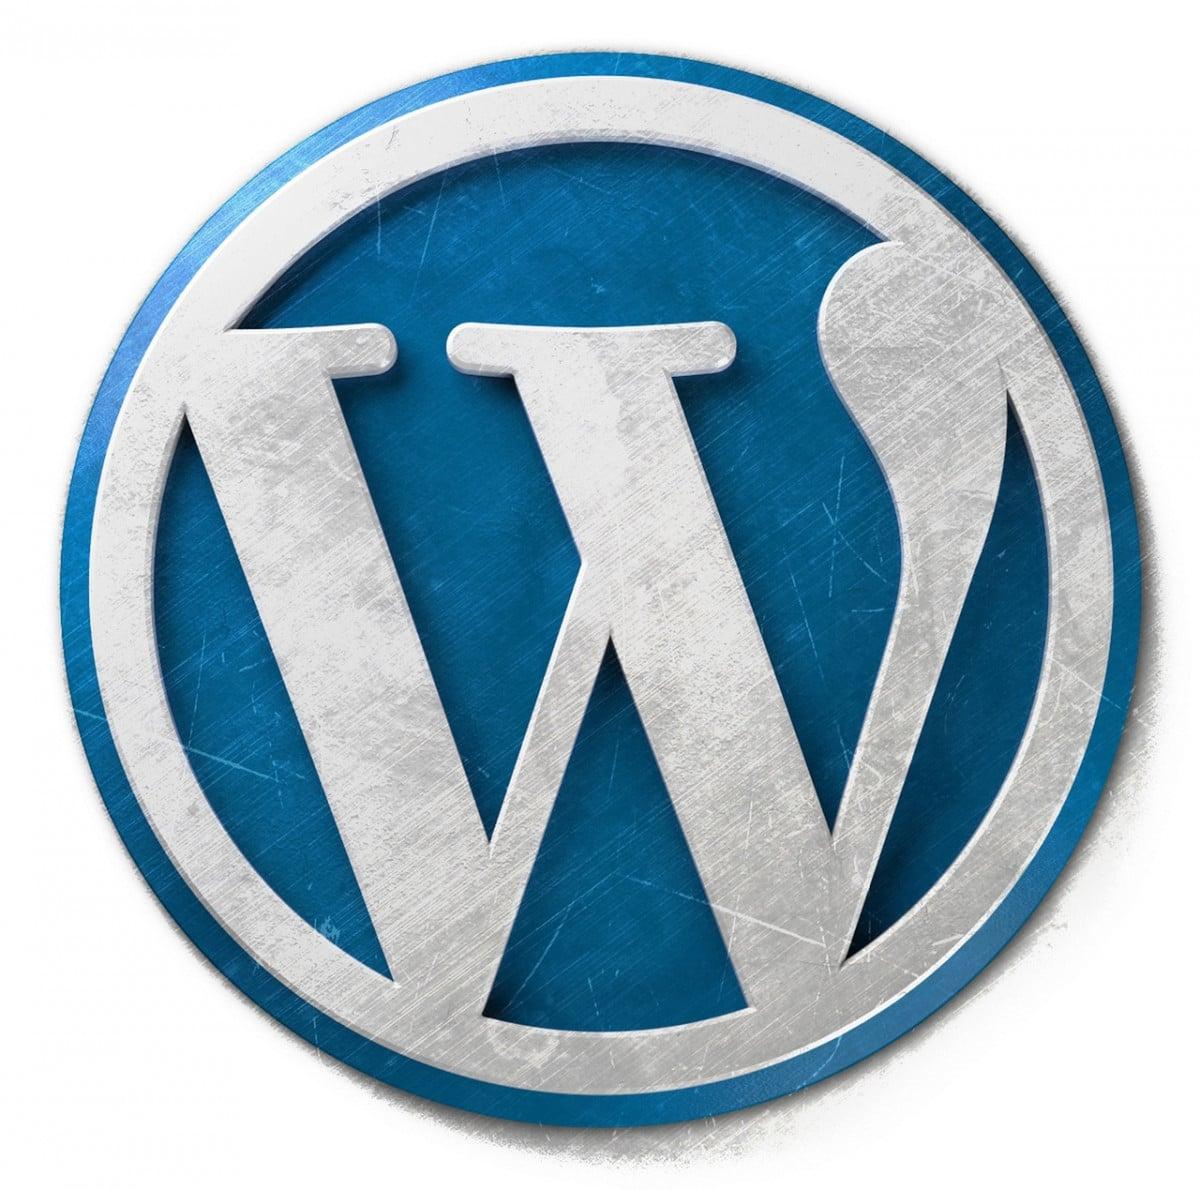 WordPress image illustration from themakemoneycenter